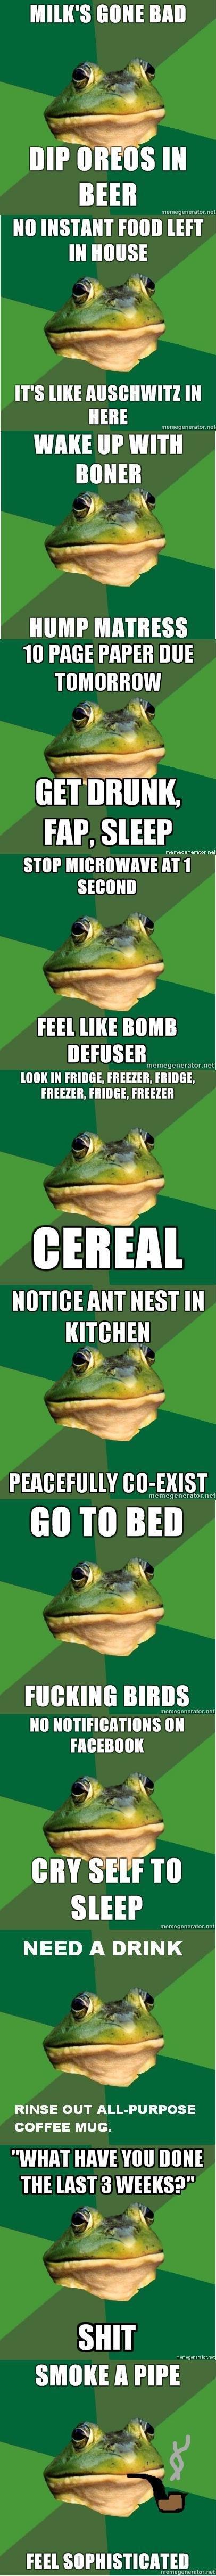 FBF pt1. Frogs a-plenty.<br /> /funny_pictures/639999/FBF+pt2/. MESS BEER llnr: lno. r: i. xiranor. ii' mi diblie; - tlt. HUMP MATHE'S 10 PAGE PAPER DUE t Frog meme fbf lol